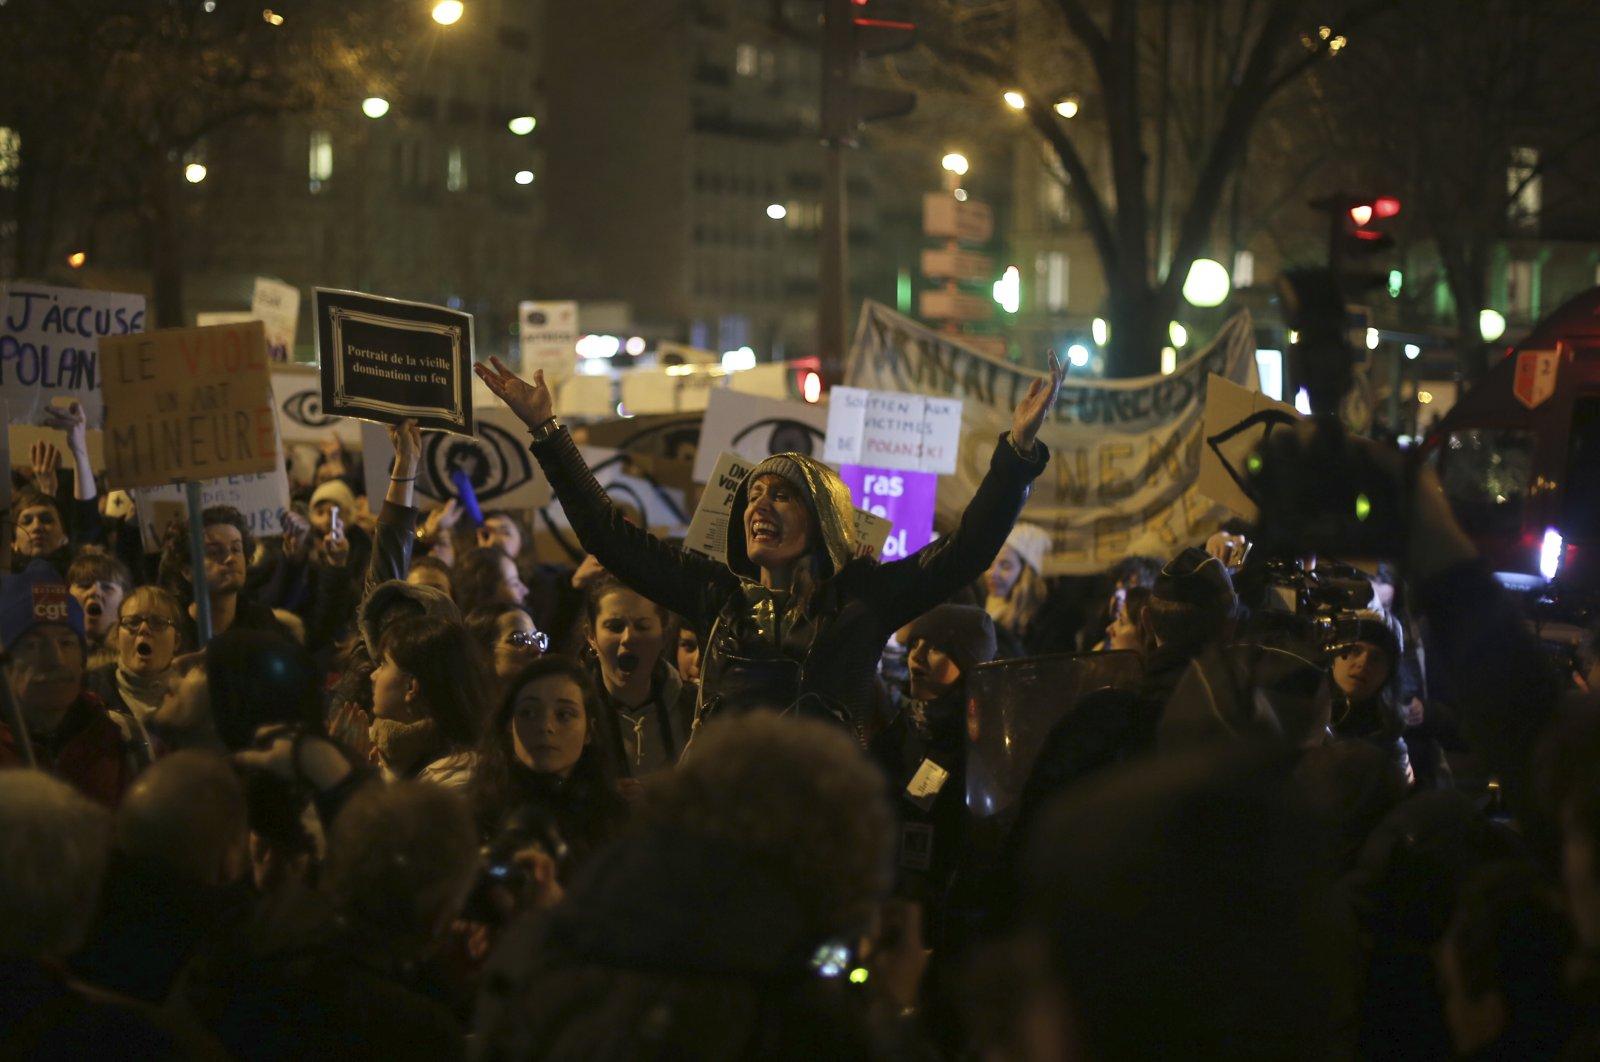 Women protest near the venue of the Cesar awards ceremony, Paris, Feb. 28, 2020. (AP Photo)